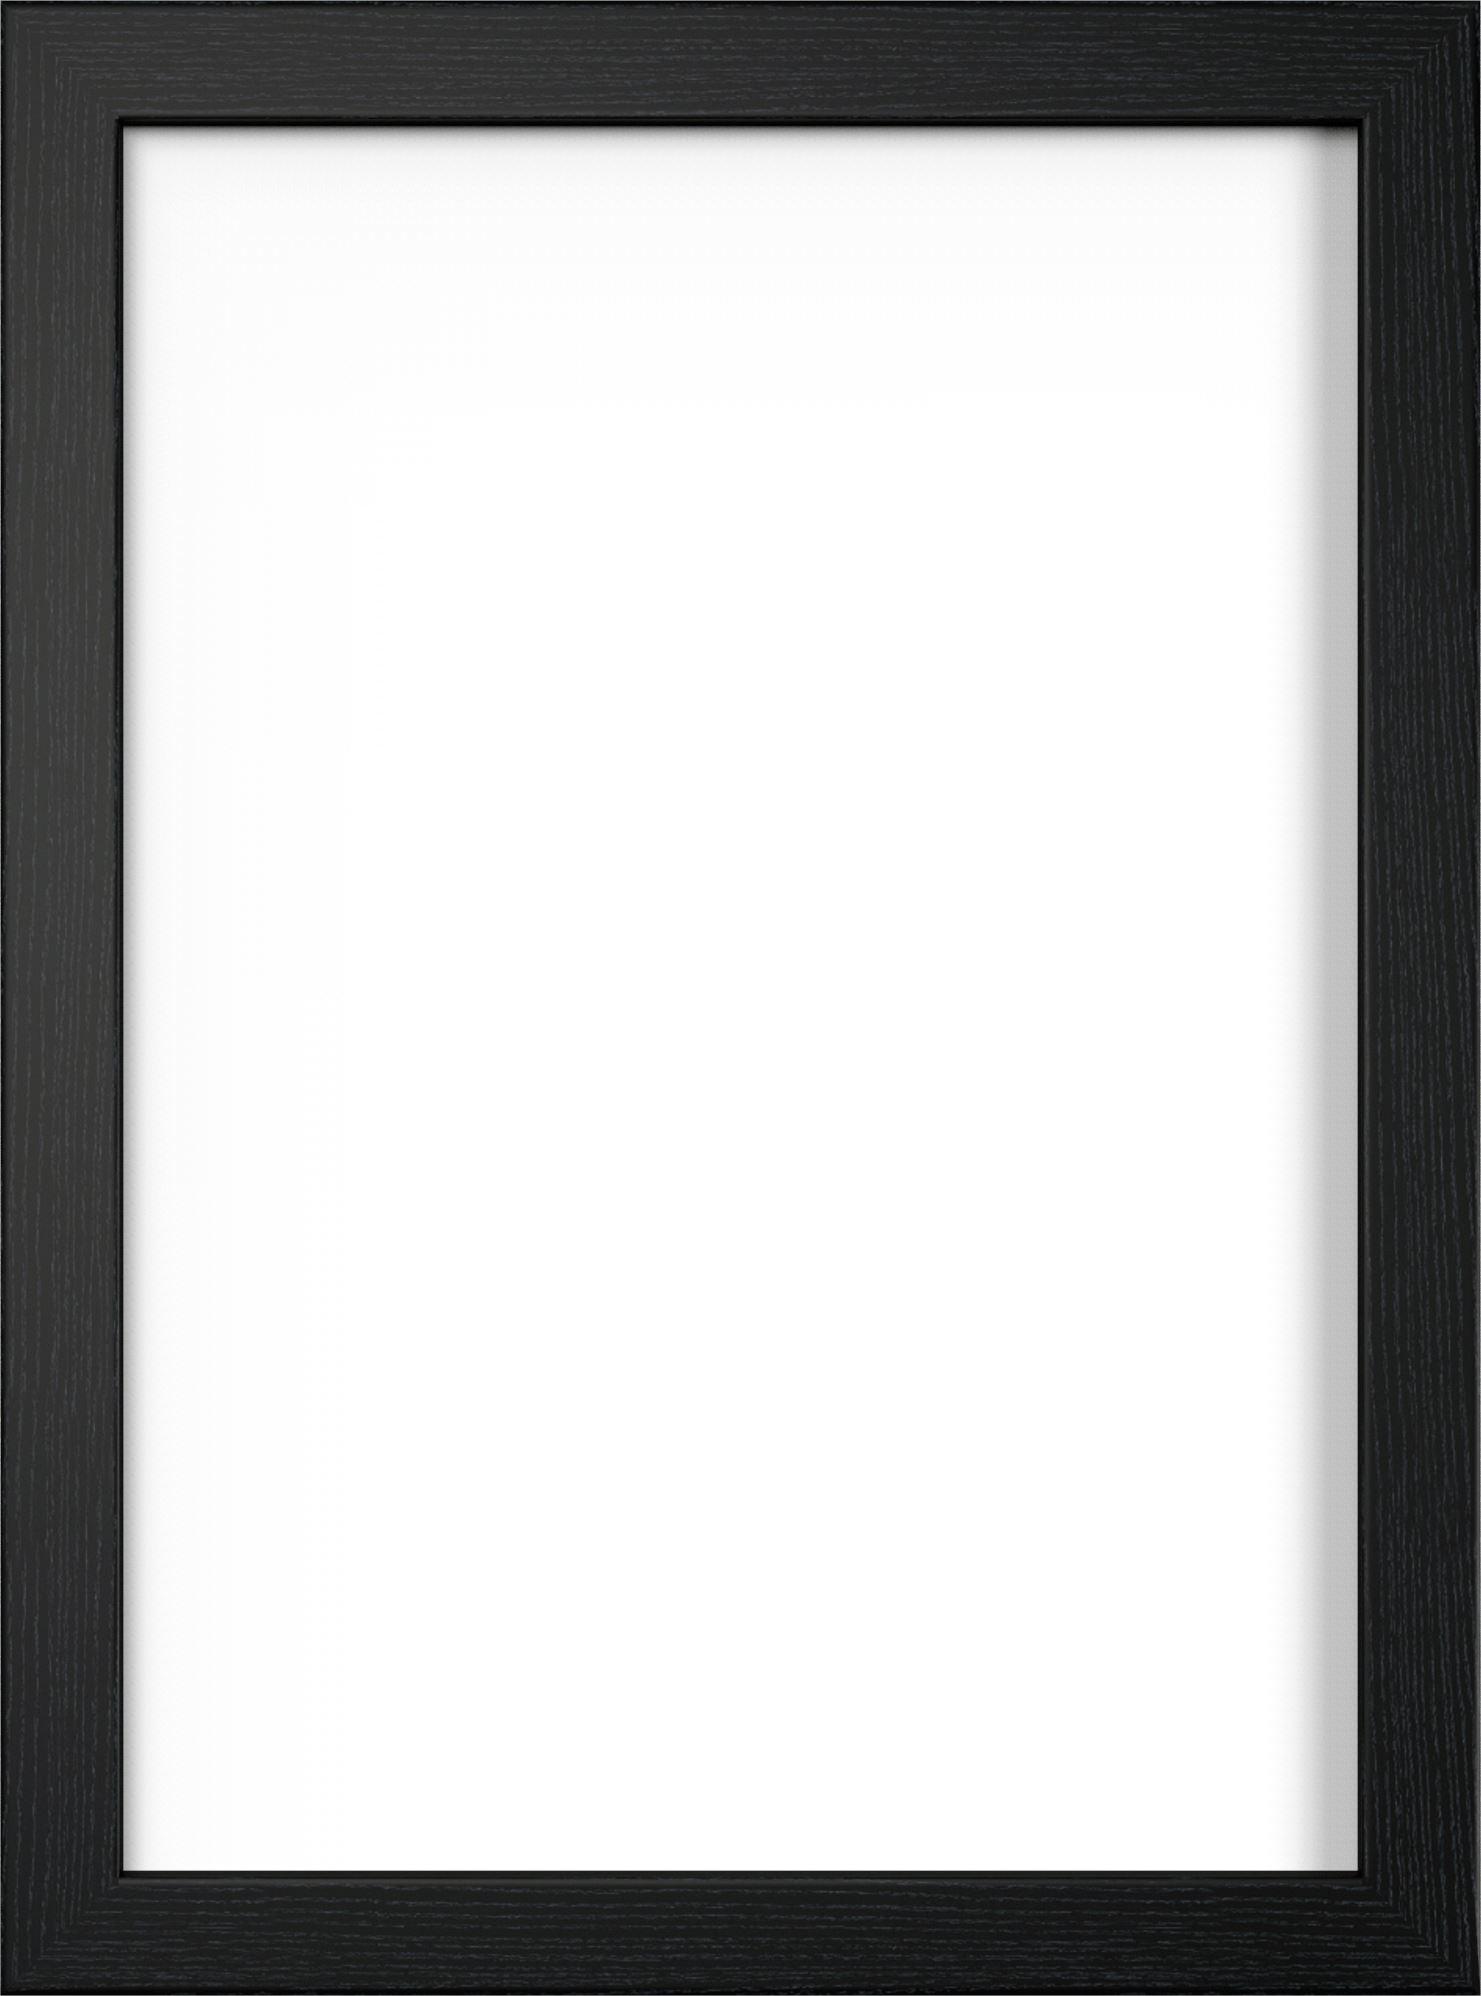 Poster frames uk